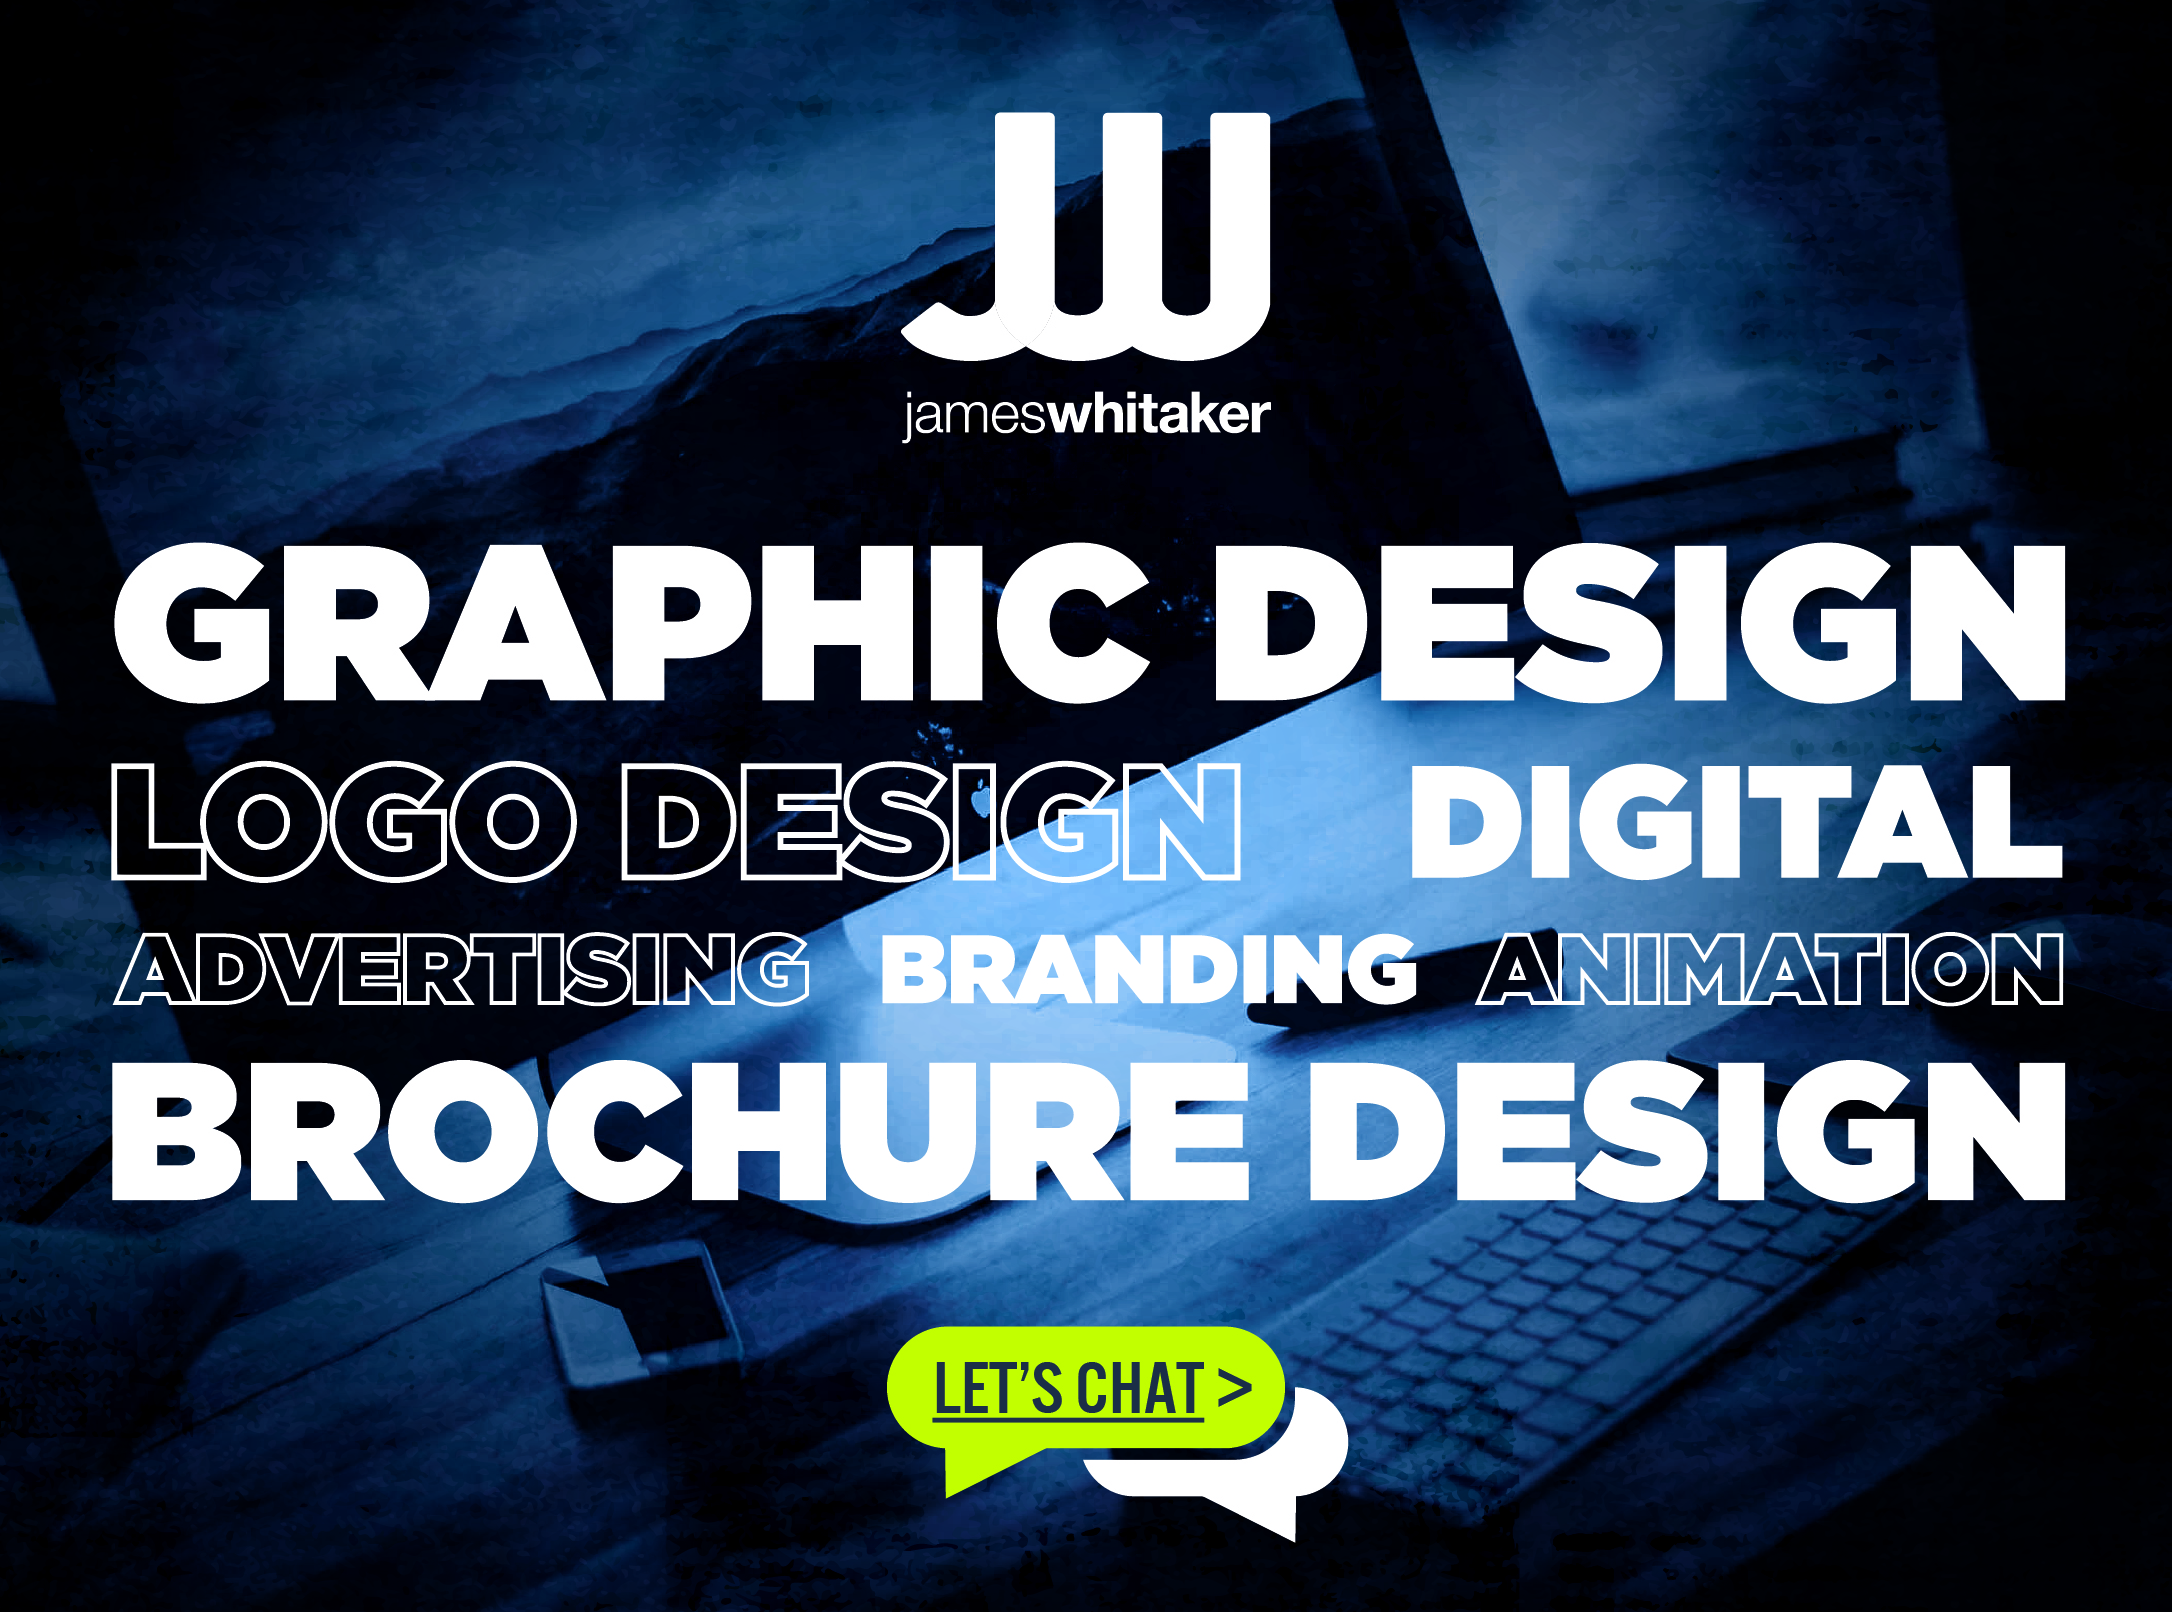 James_d_whitaker_graphic_design